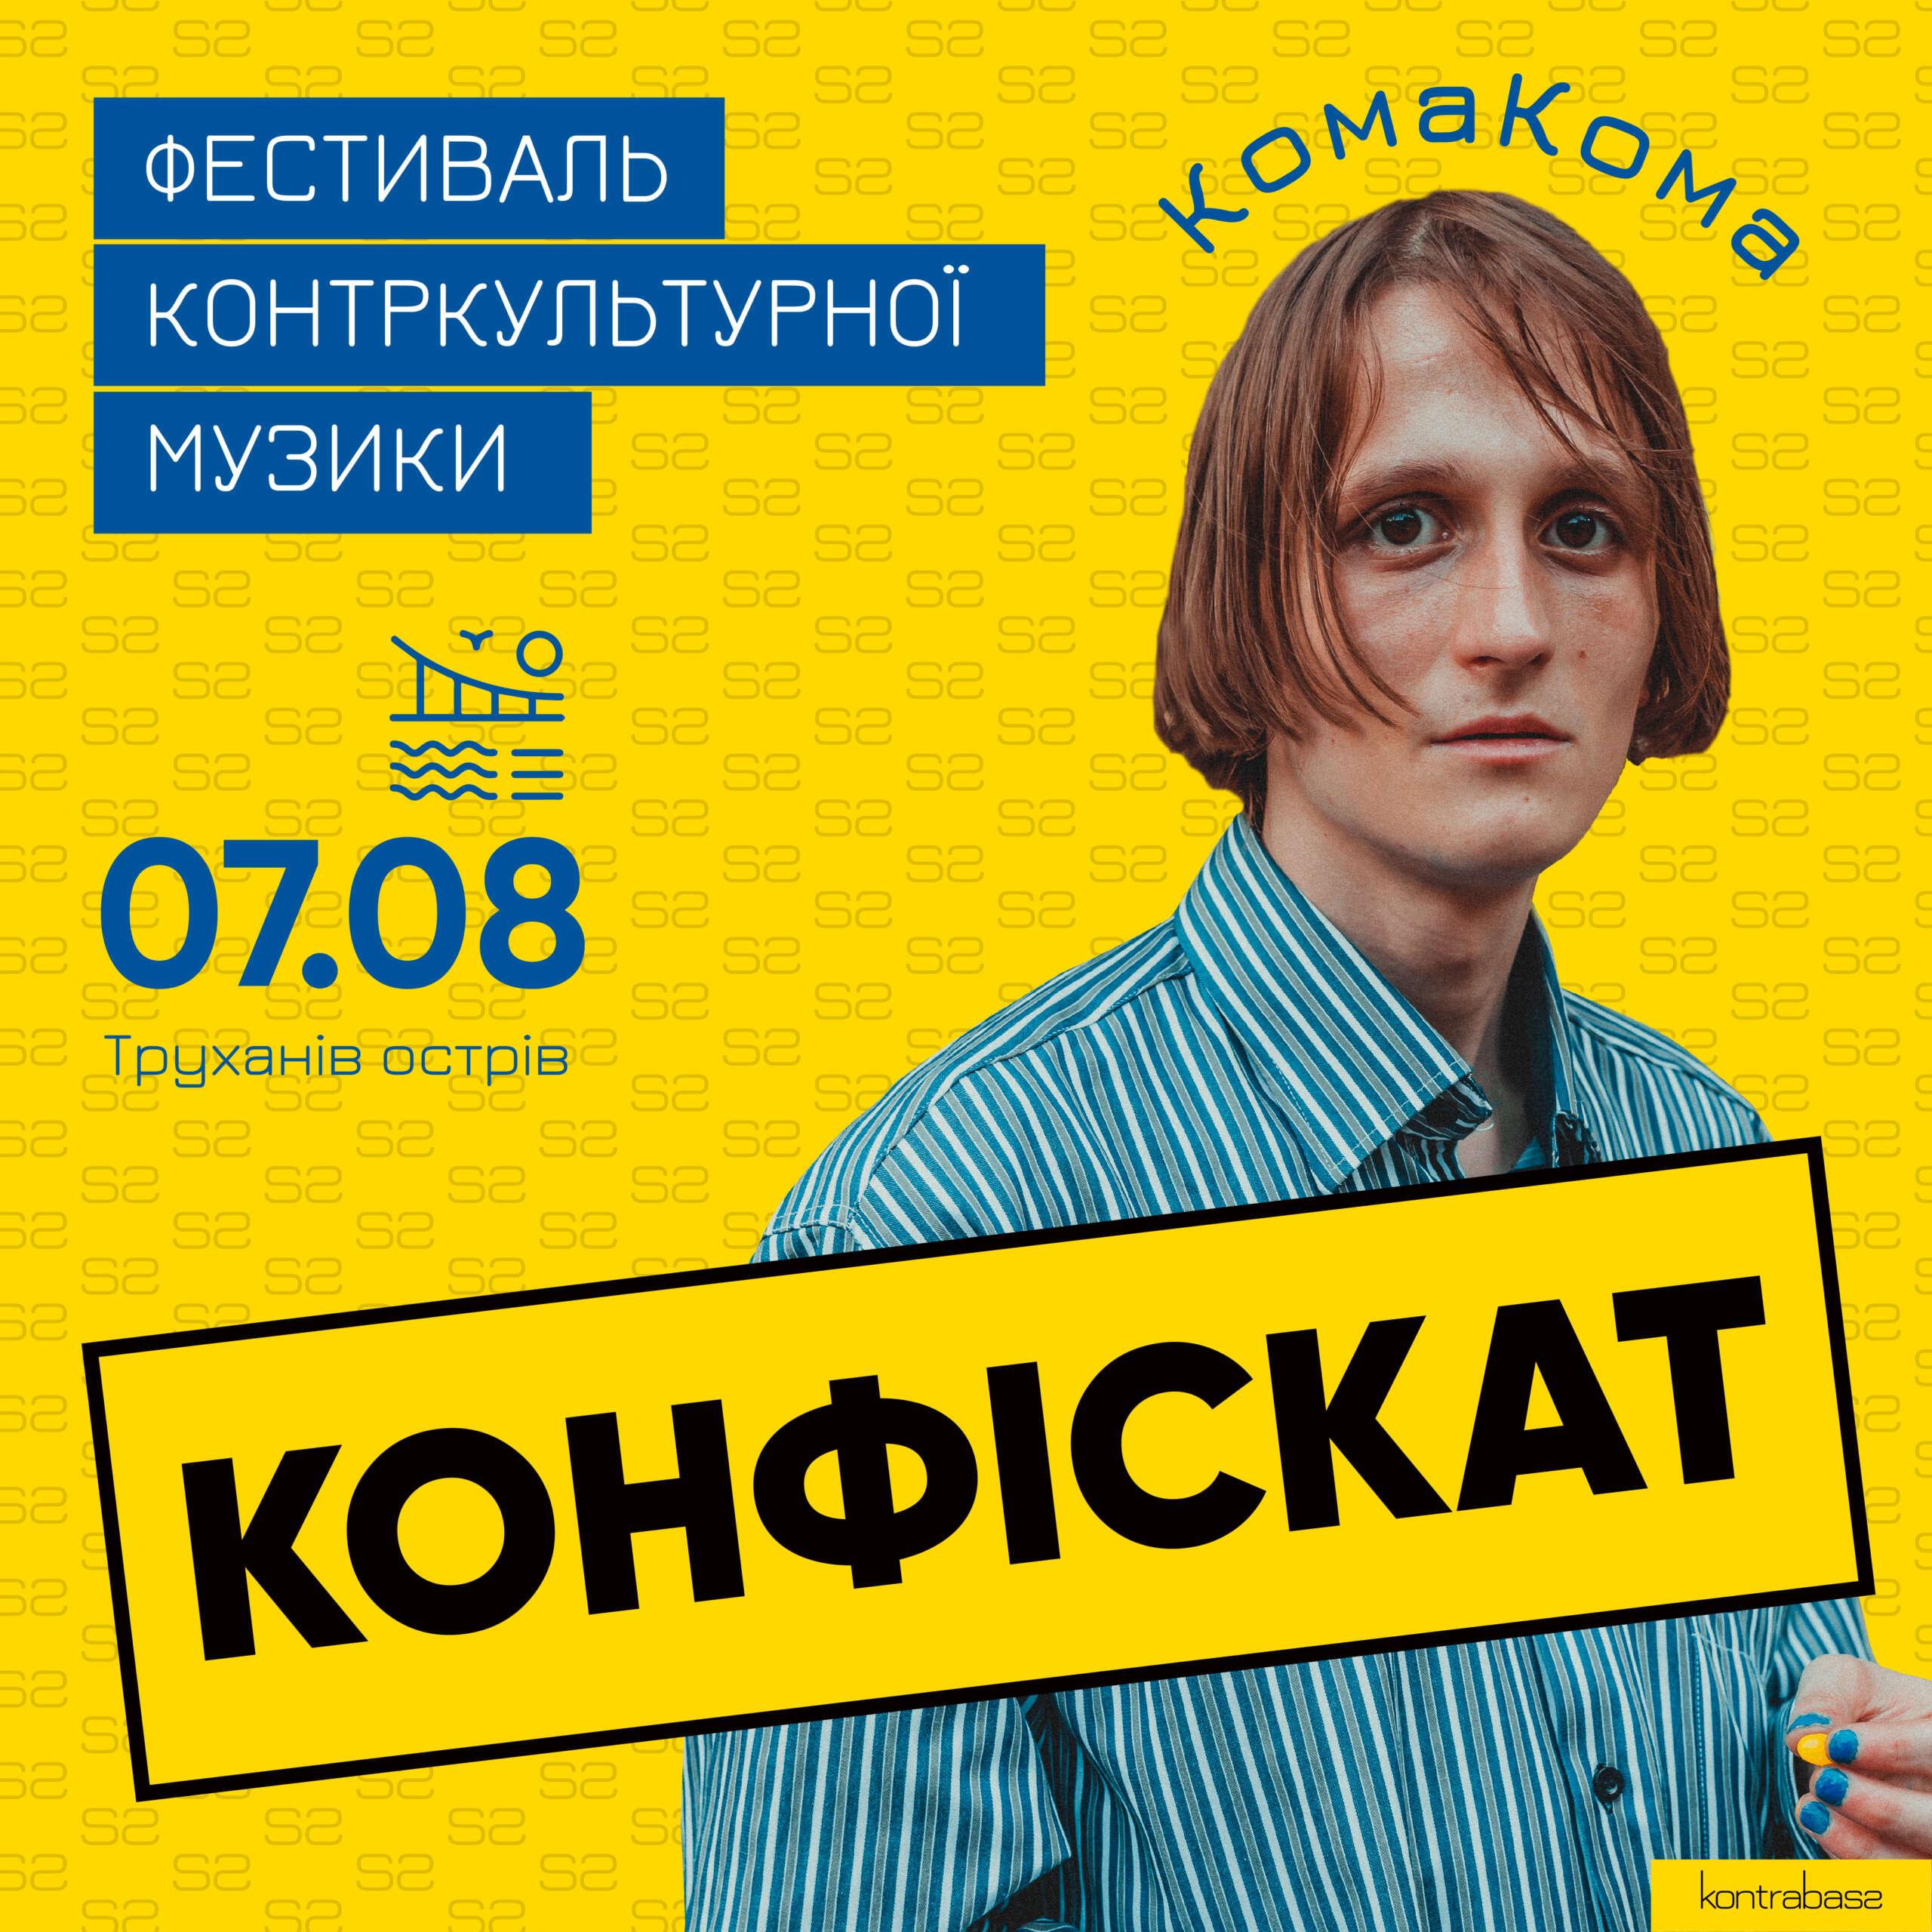 konfiskat-dtf-magazine7